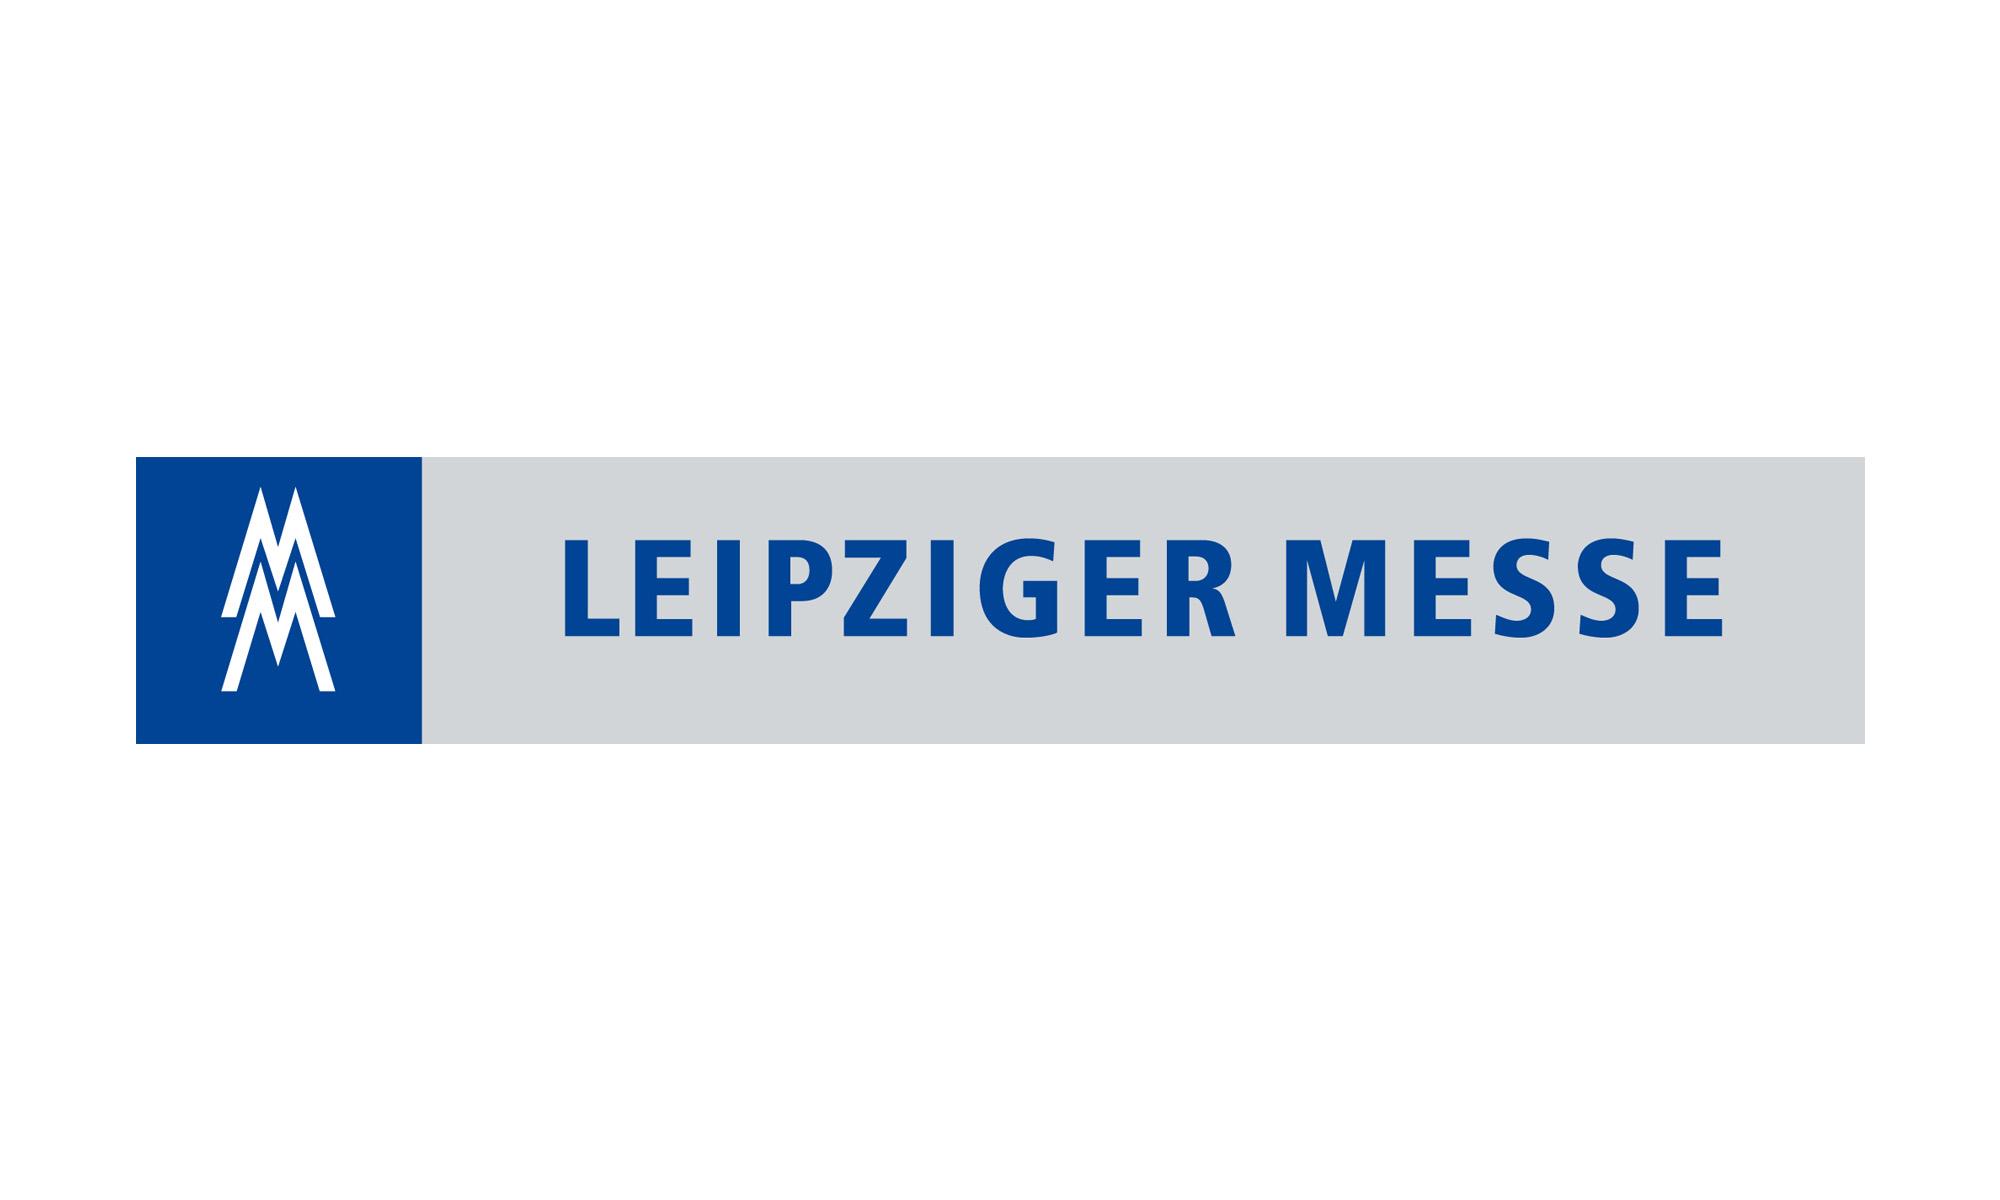 Leipziger Messe GmbH Leipzig